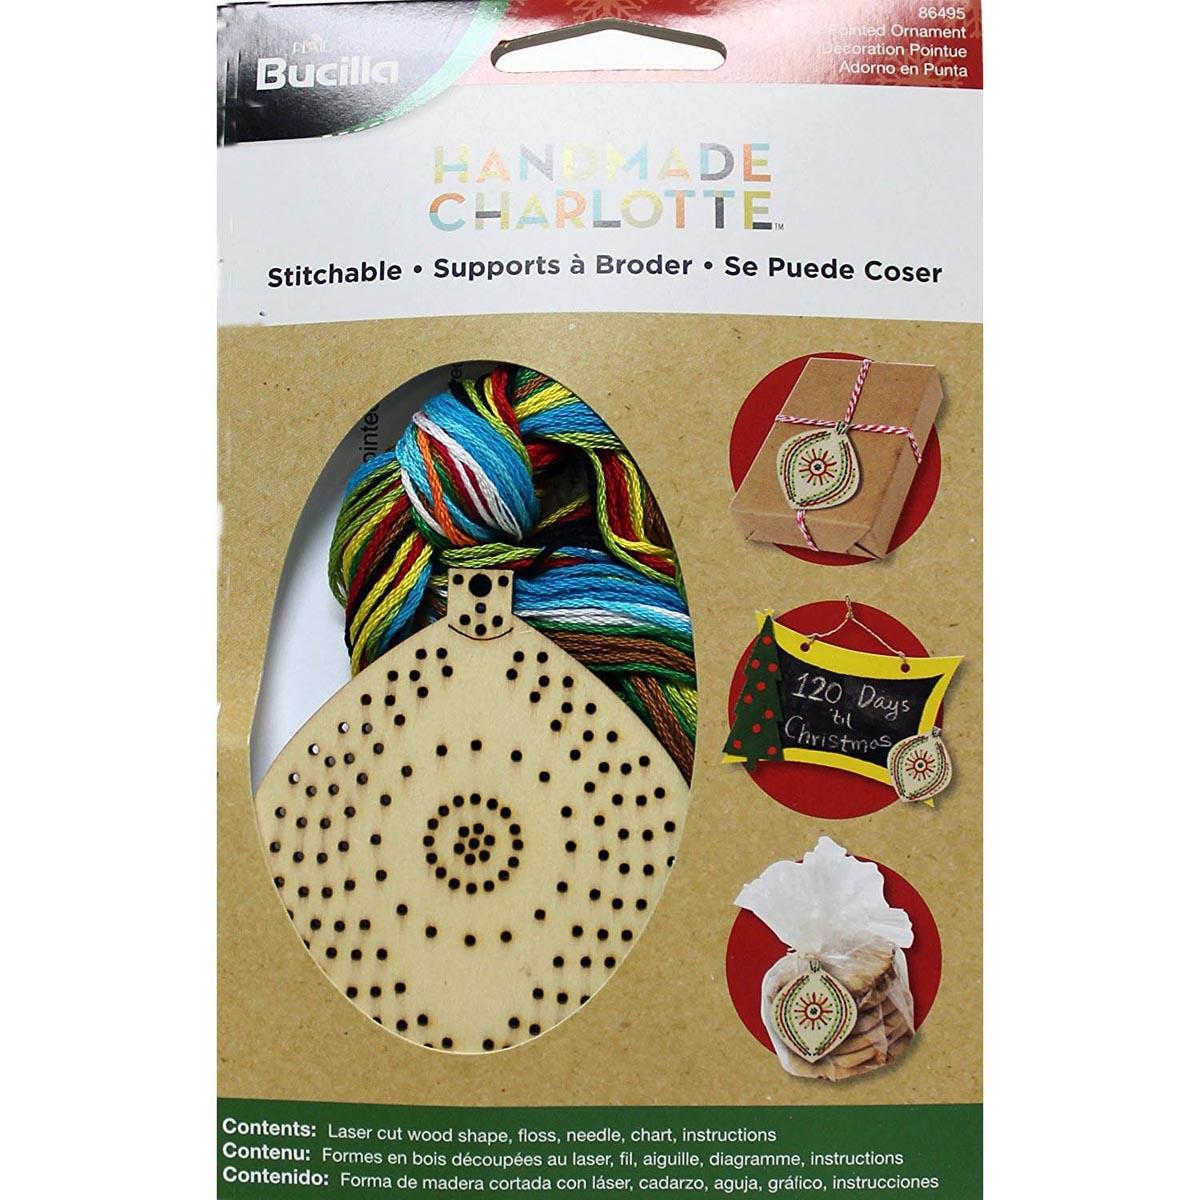 Bucilla ® Seasonal Handmade Charlotte™ Wood Stitchables - Pointed Ornament